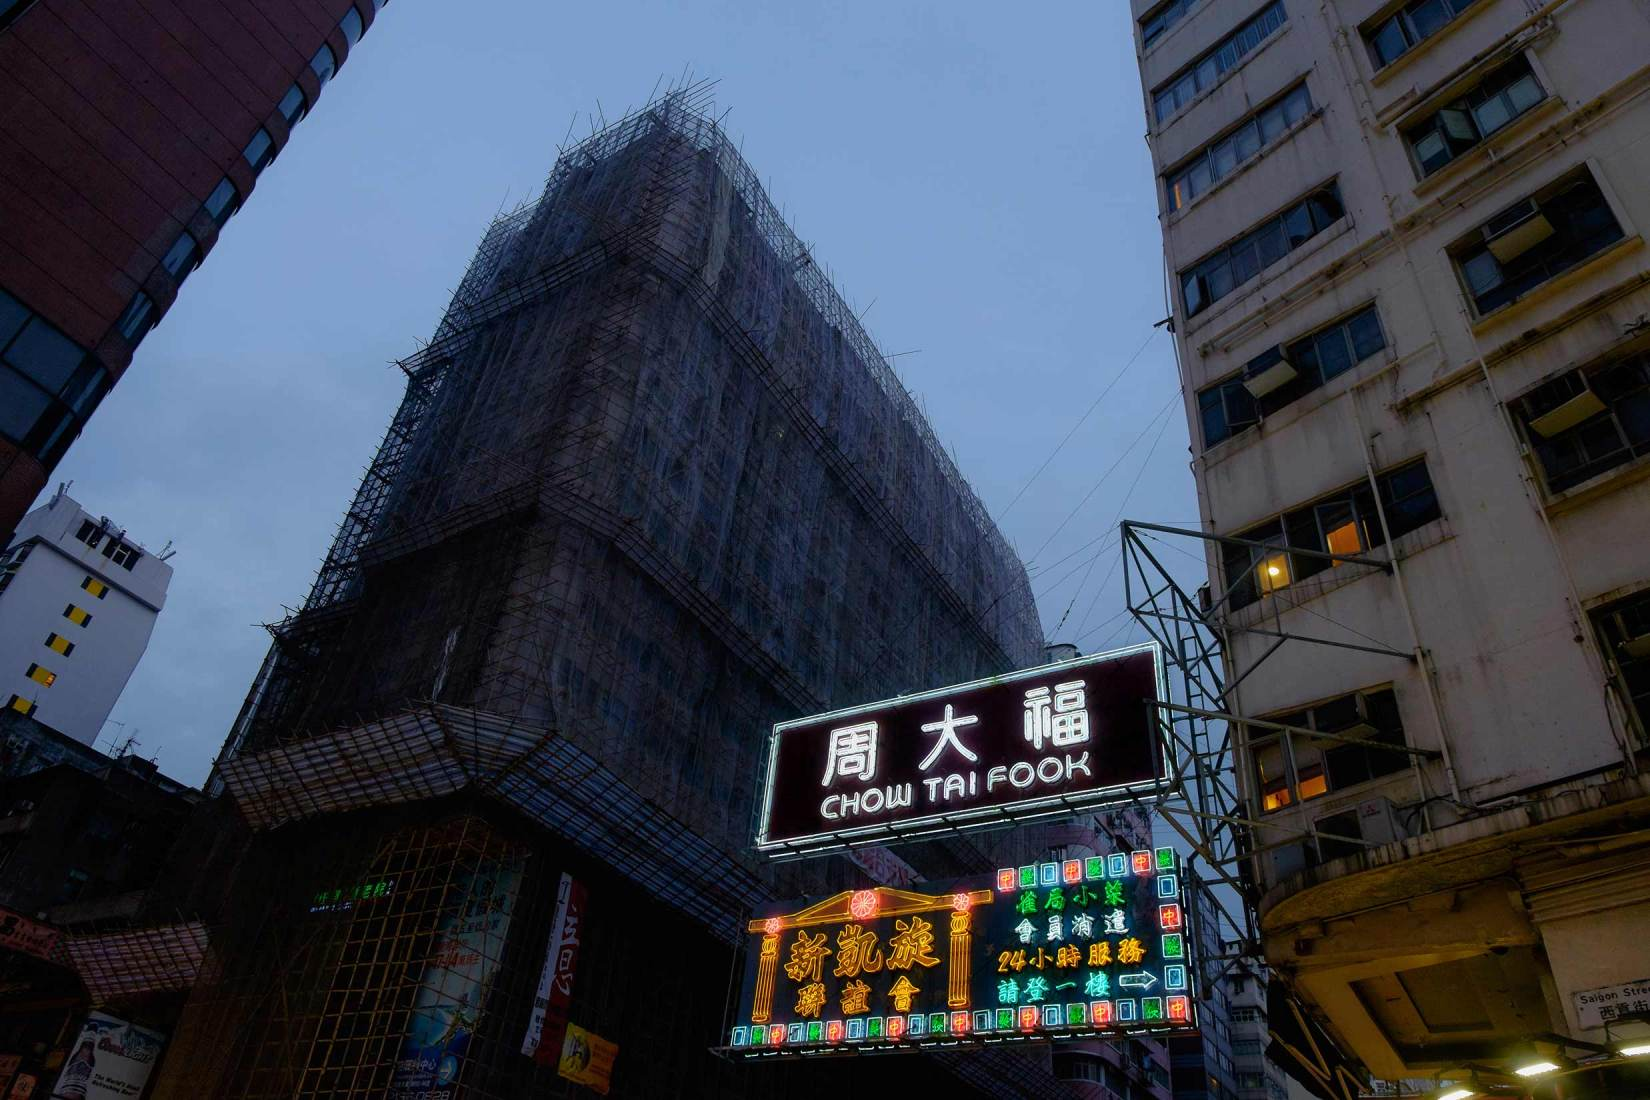 PWS020-0462-Sharon-Blance-Melbourne-photographer-Hong-Kong-neon